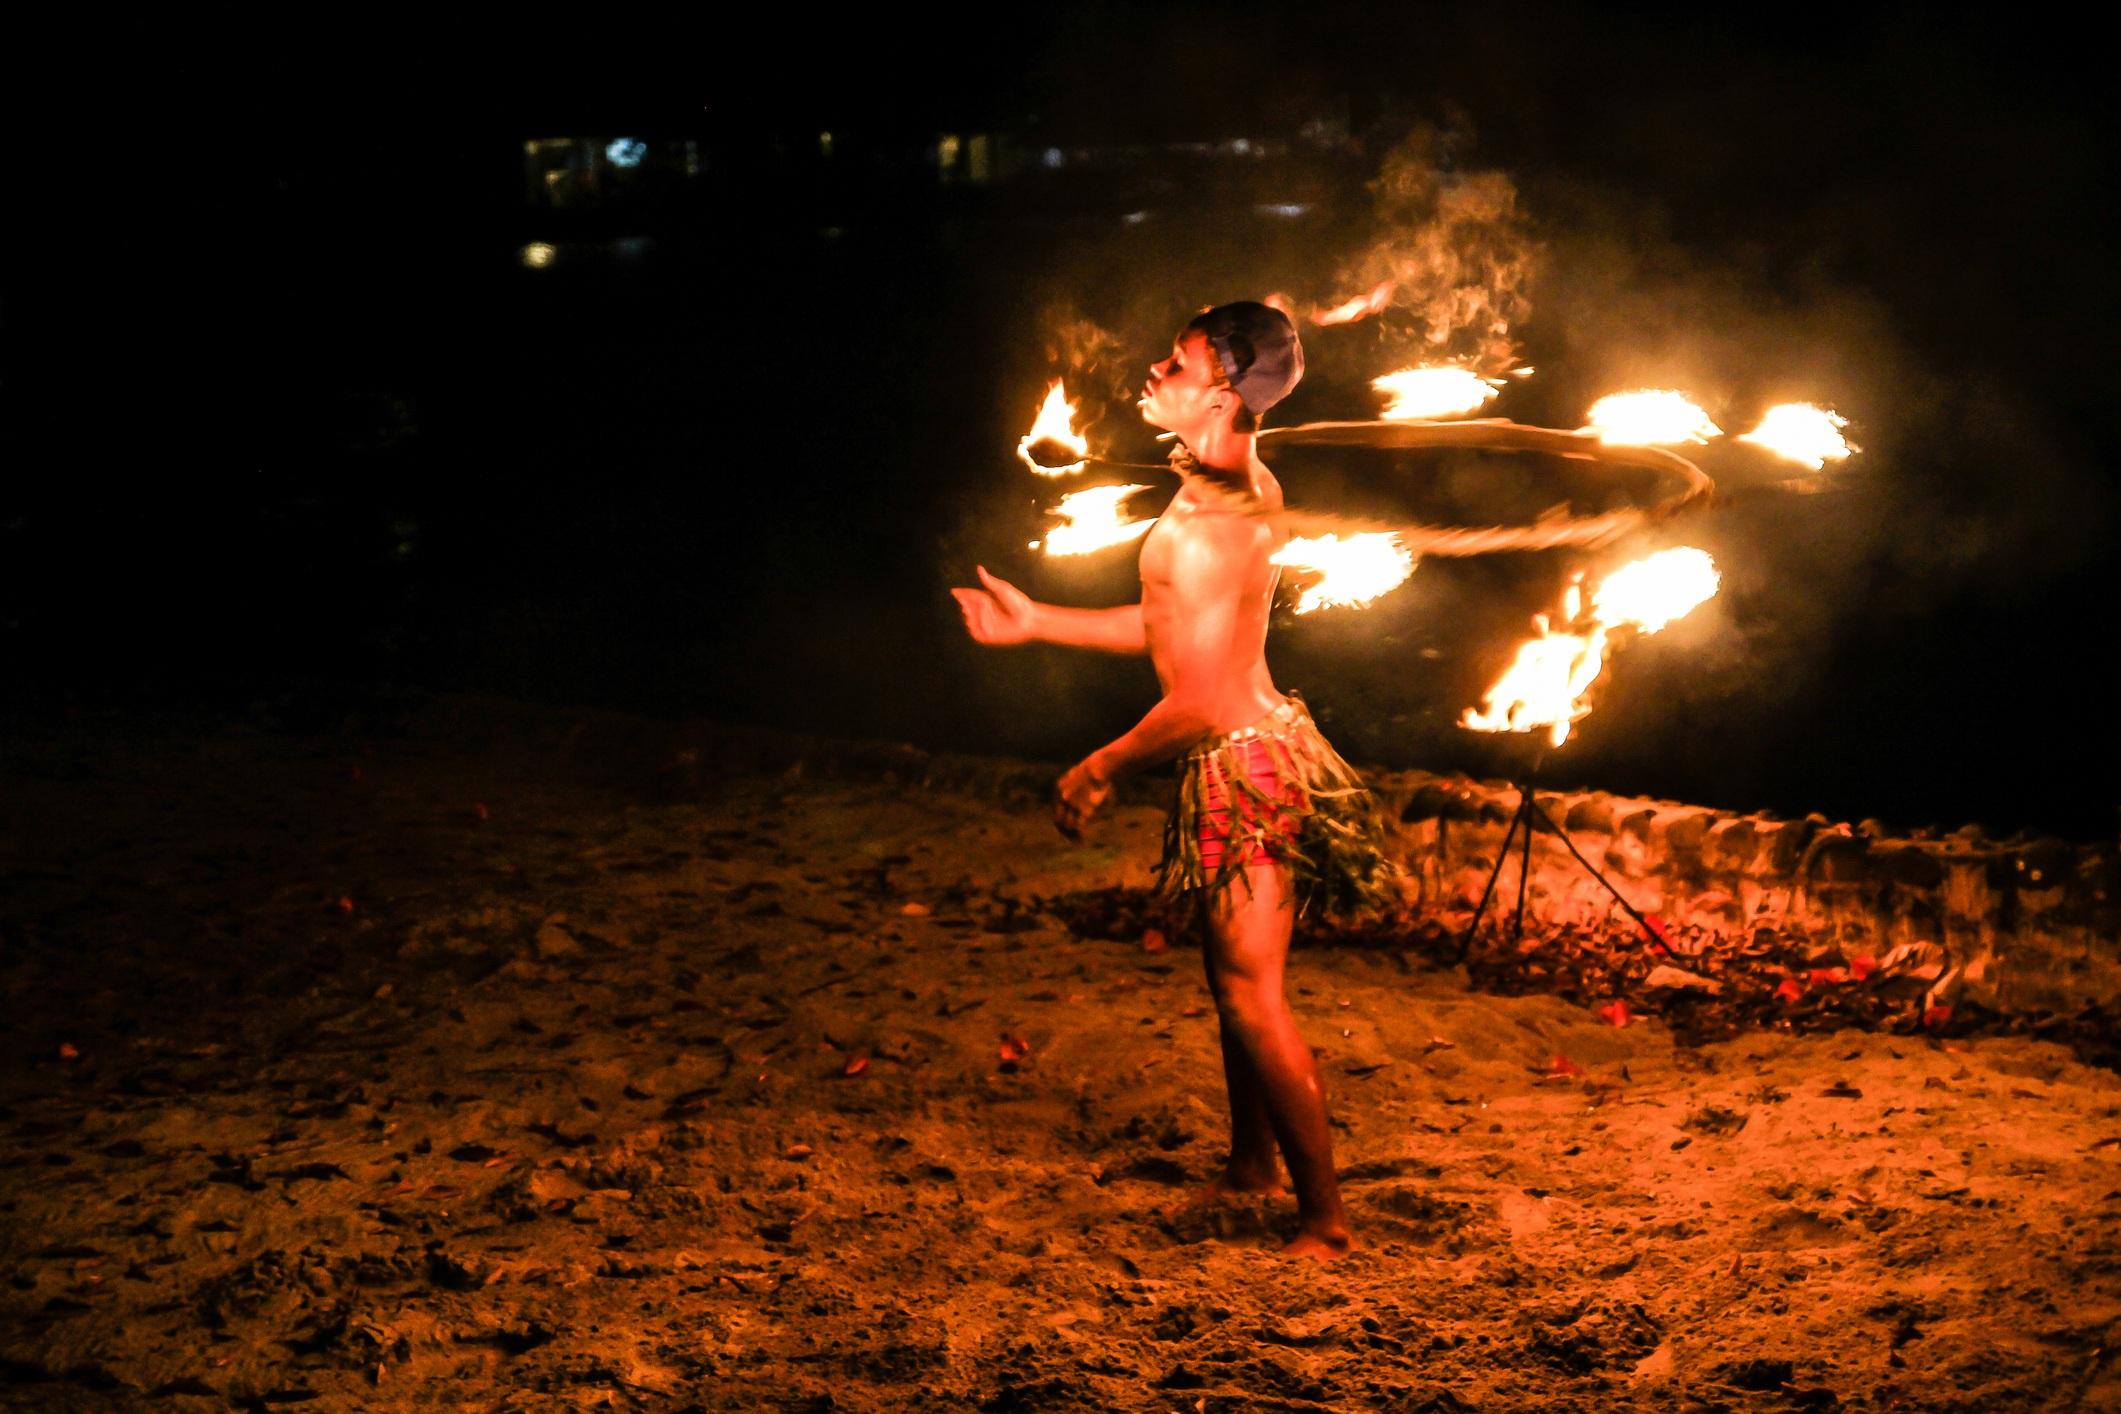 Man on fire at luau